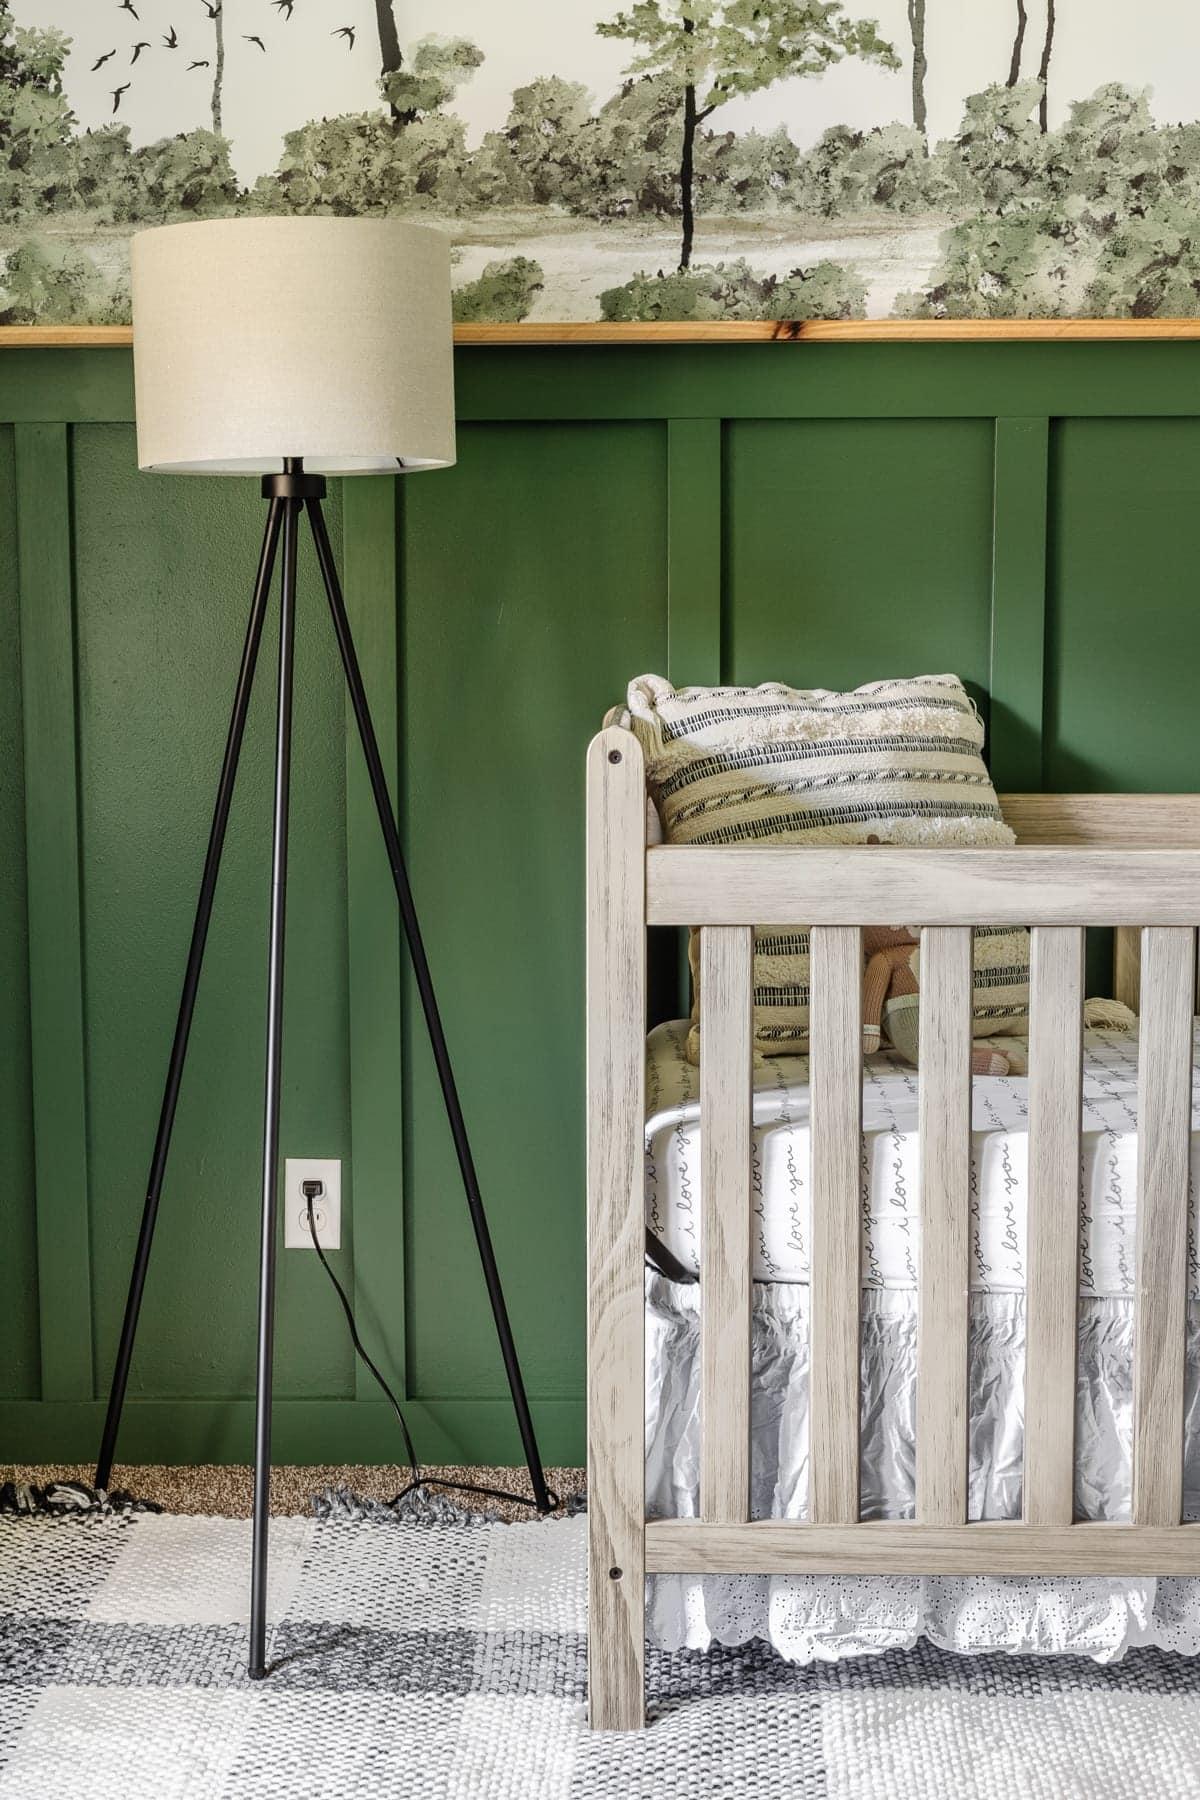 woodland theme baby boy nursery with floor lamp, natural wood crib, plaid rug, and wall mural